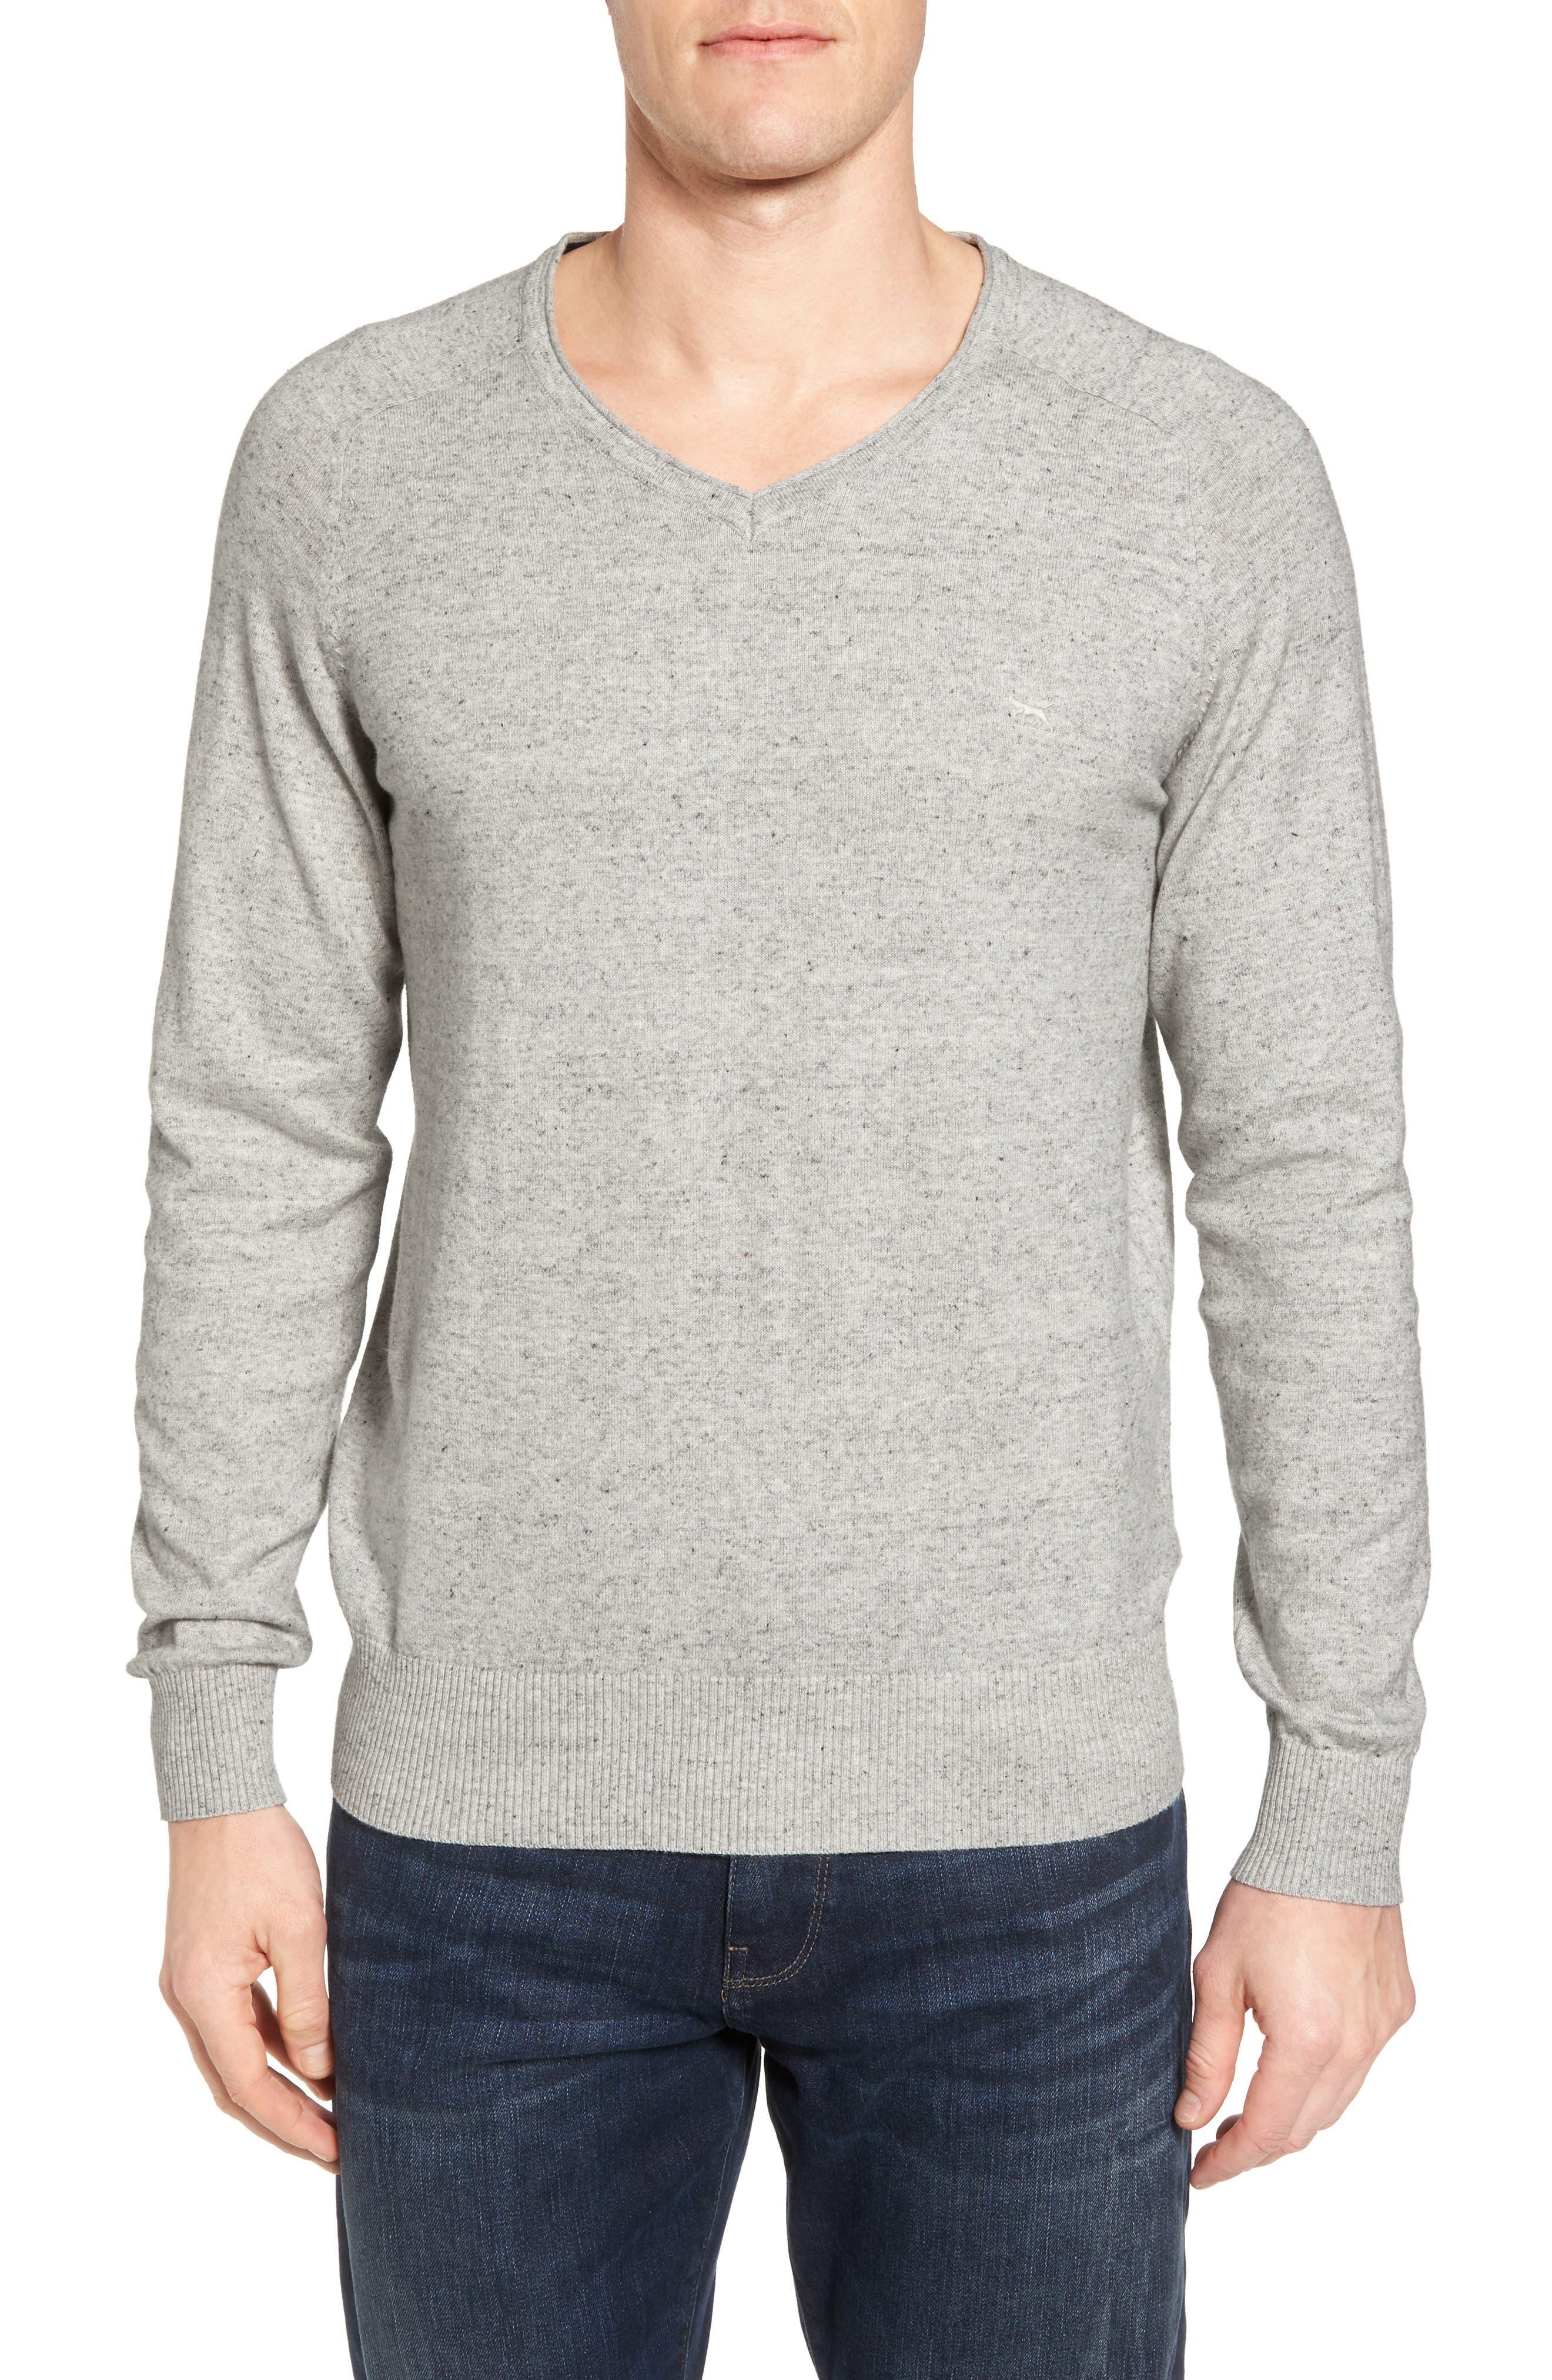 Arbors Cotton V-Neck Sweater,                             Main thumbnail 1, color,                             Oatmeal